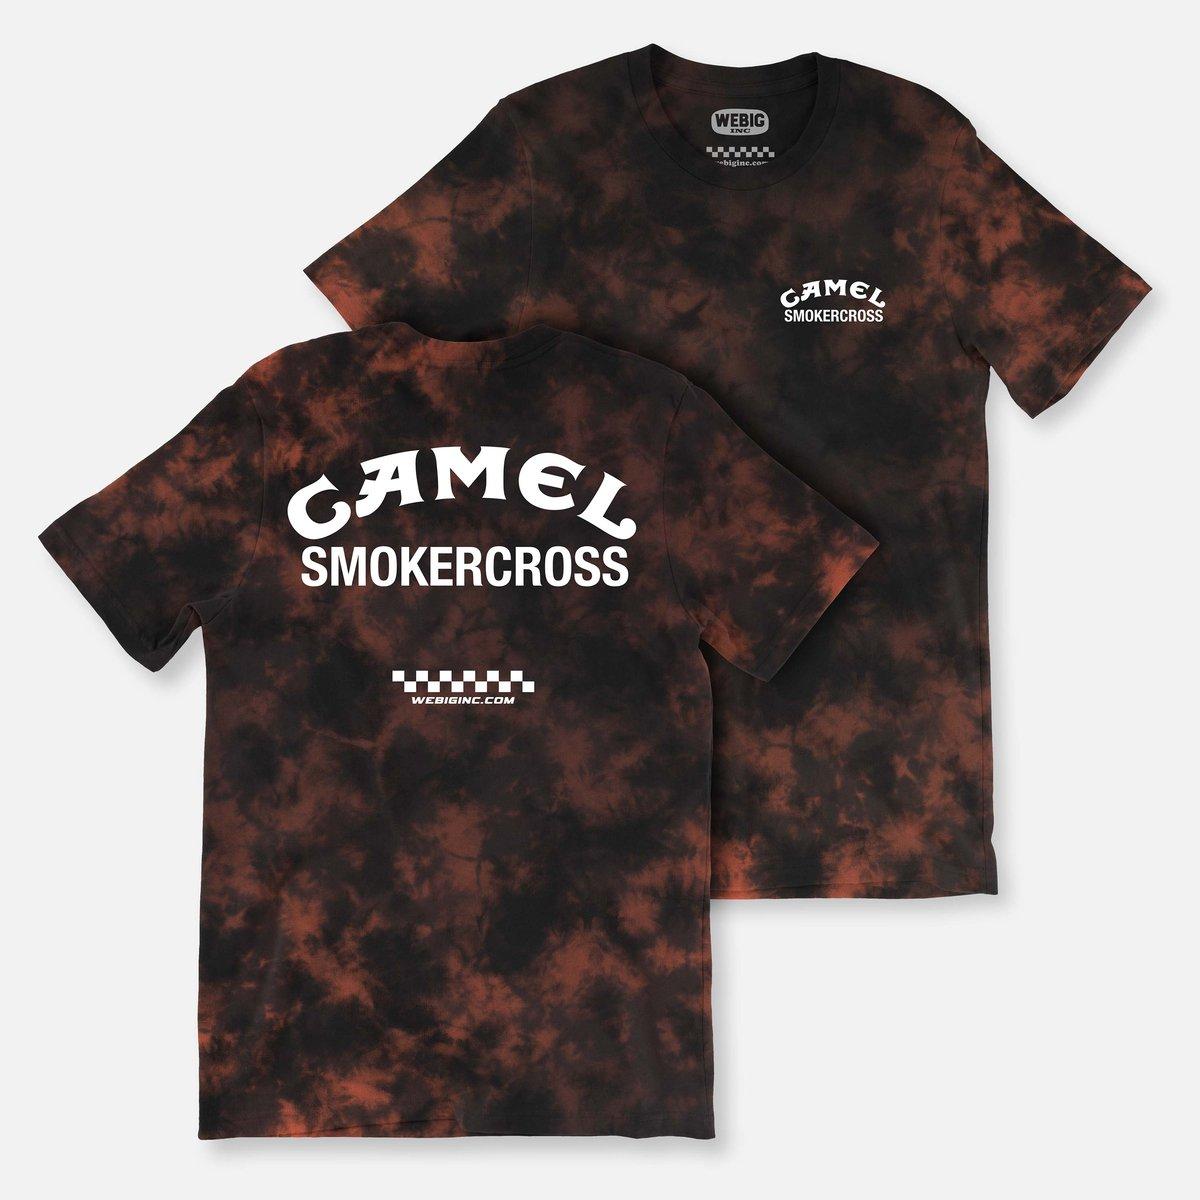 Image of CAMEL SMOKERCROSS BLACK TIE DYE TEE